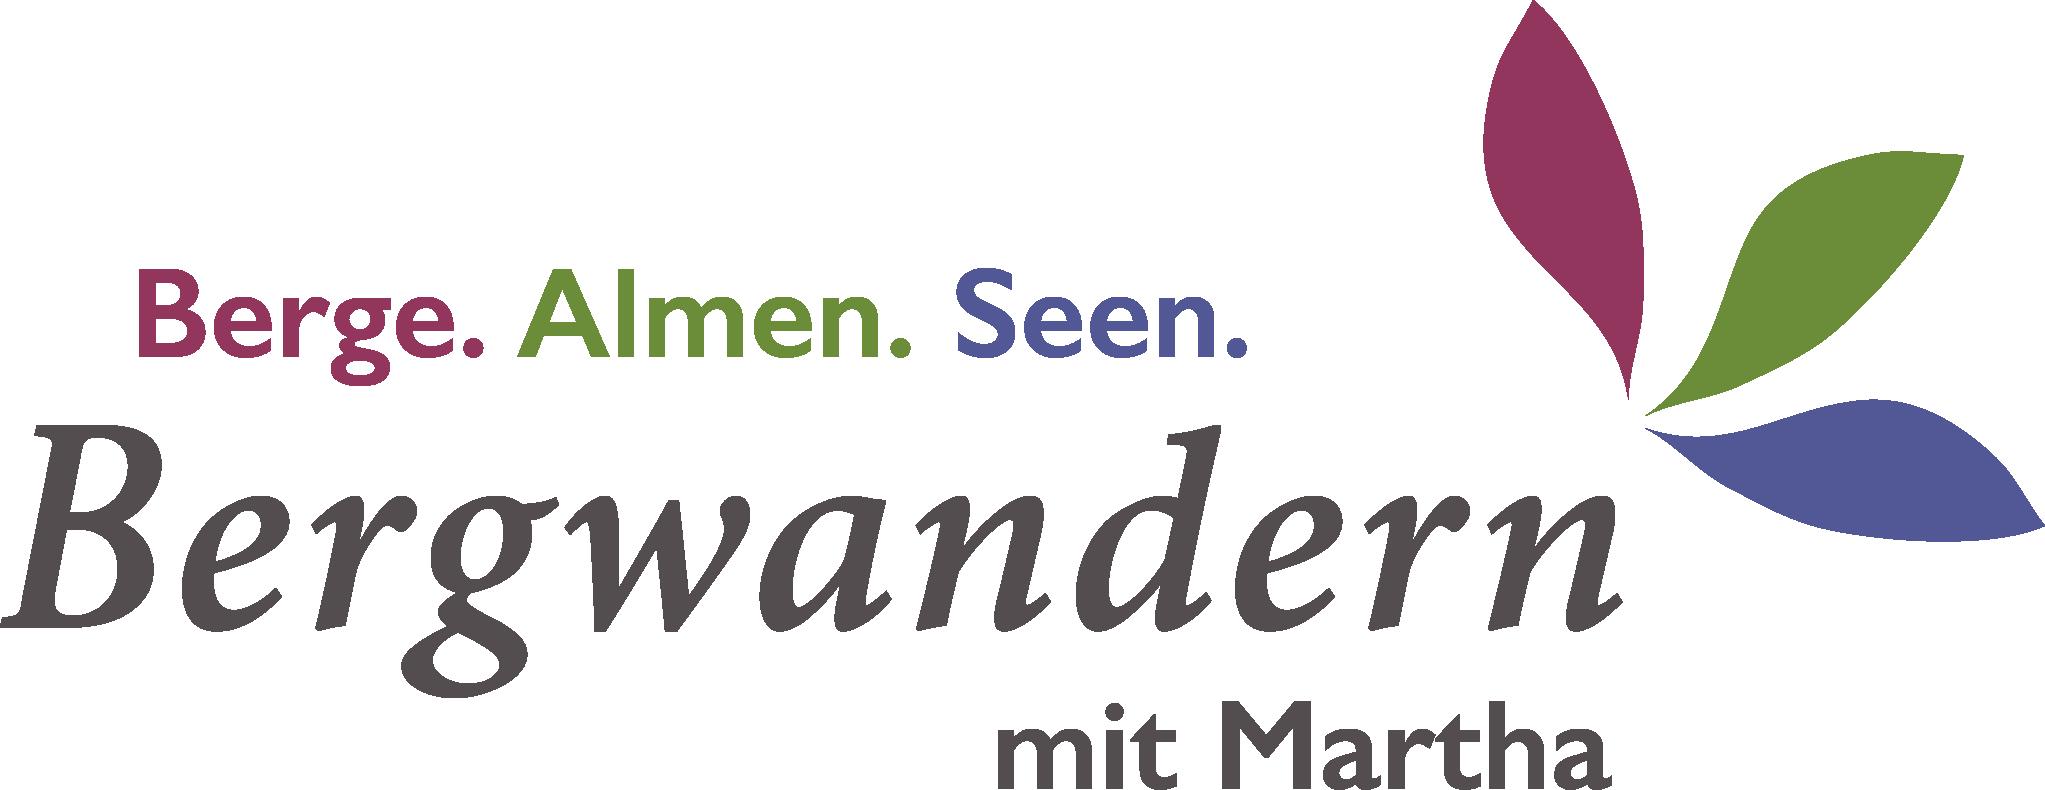 logo_bergwandern_claimpng